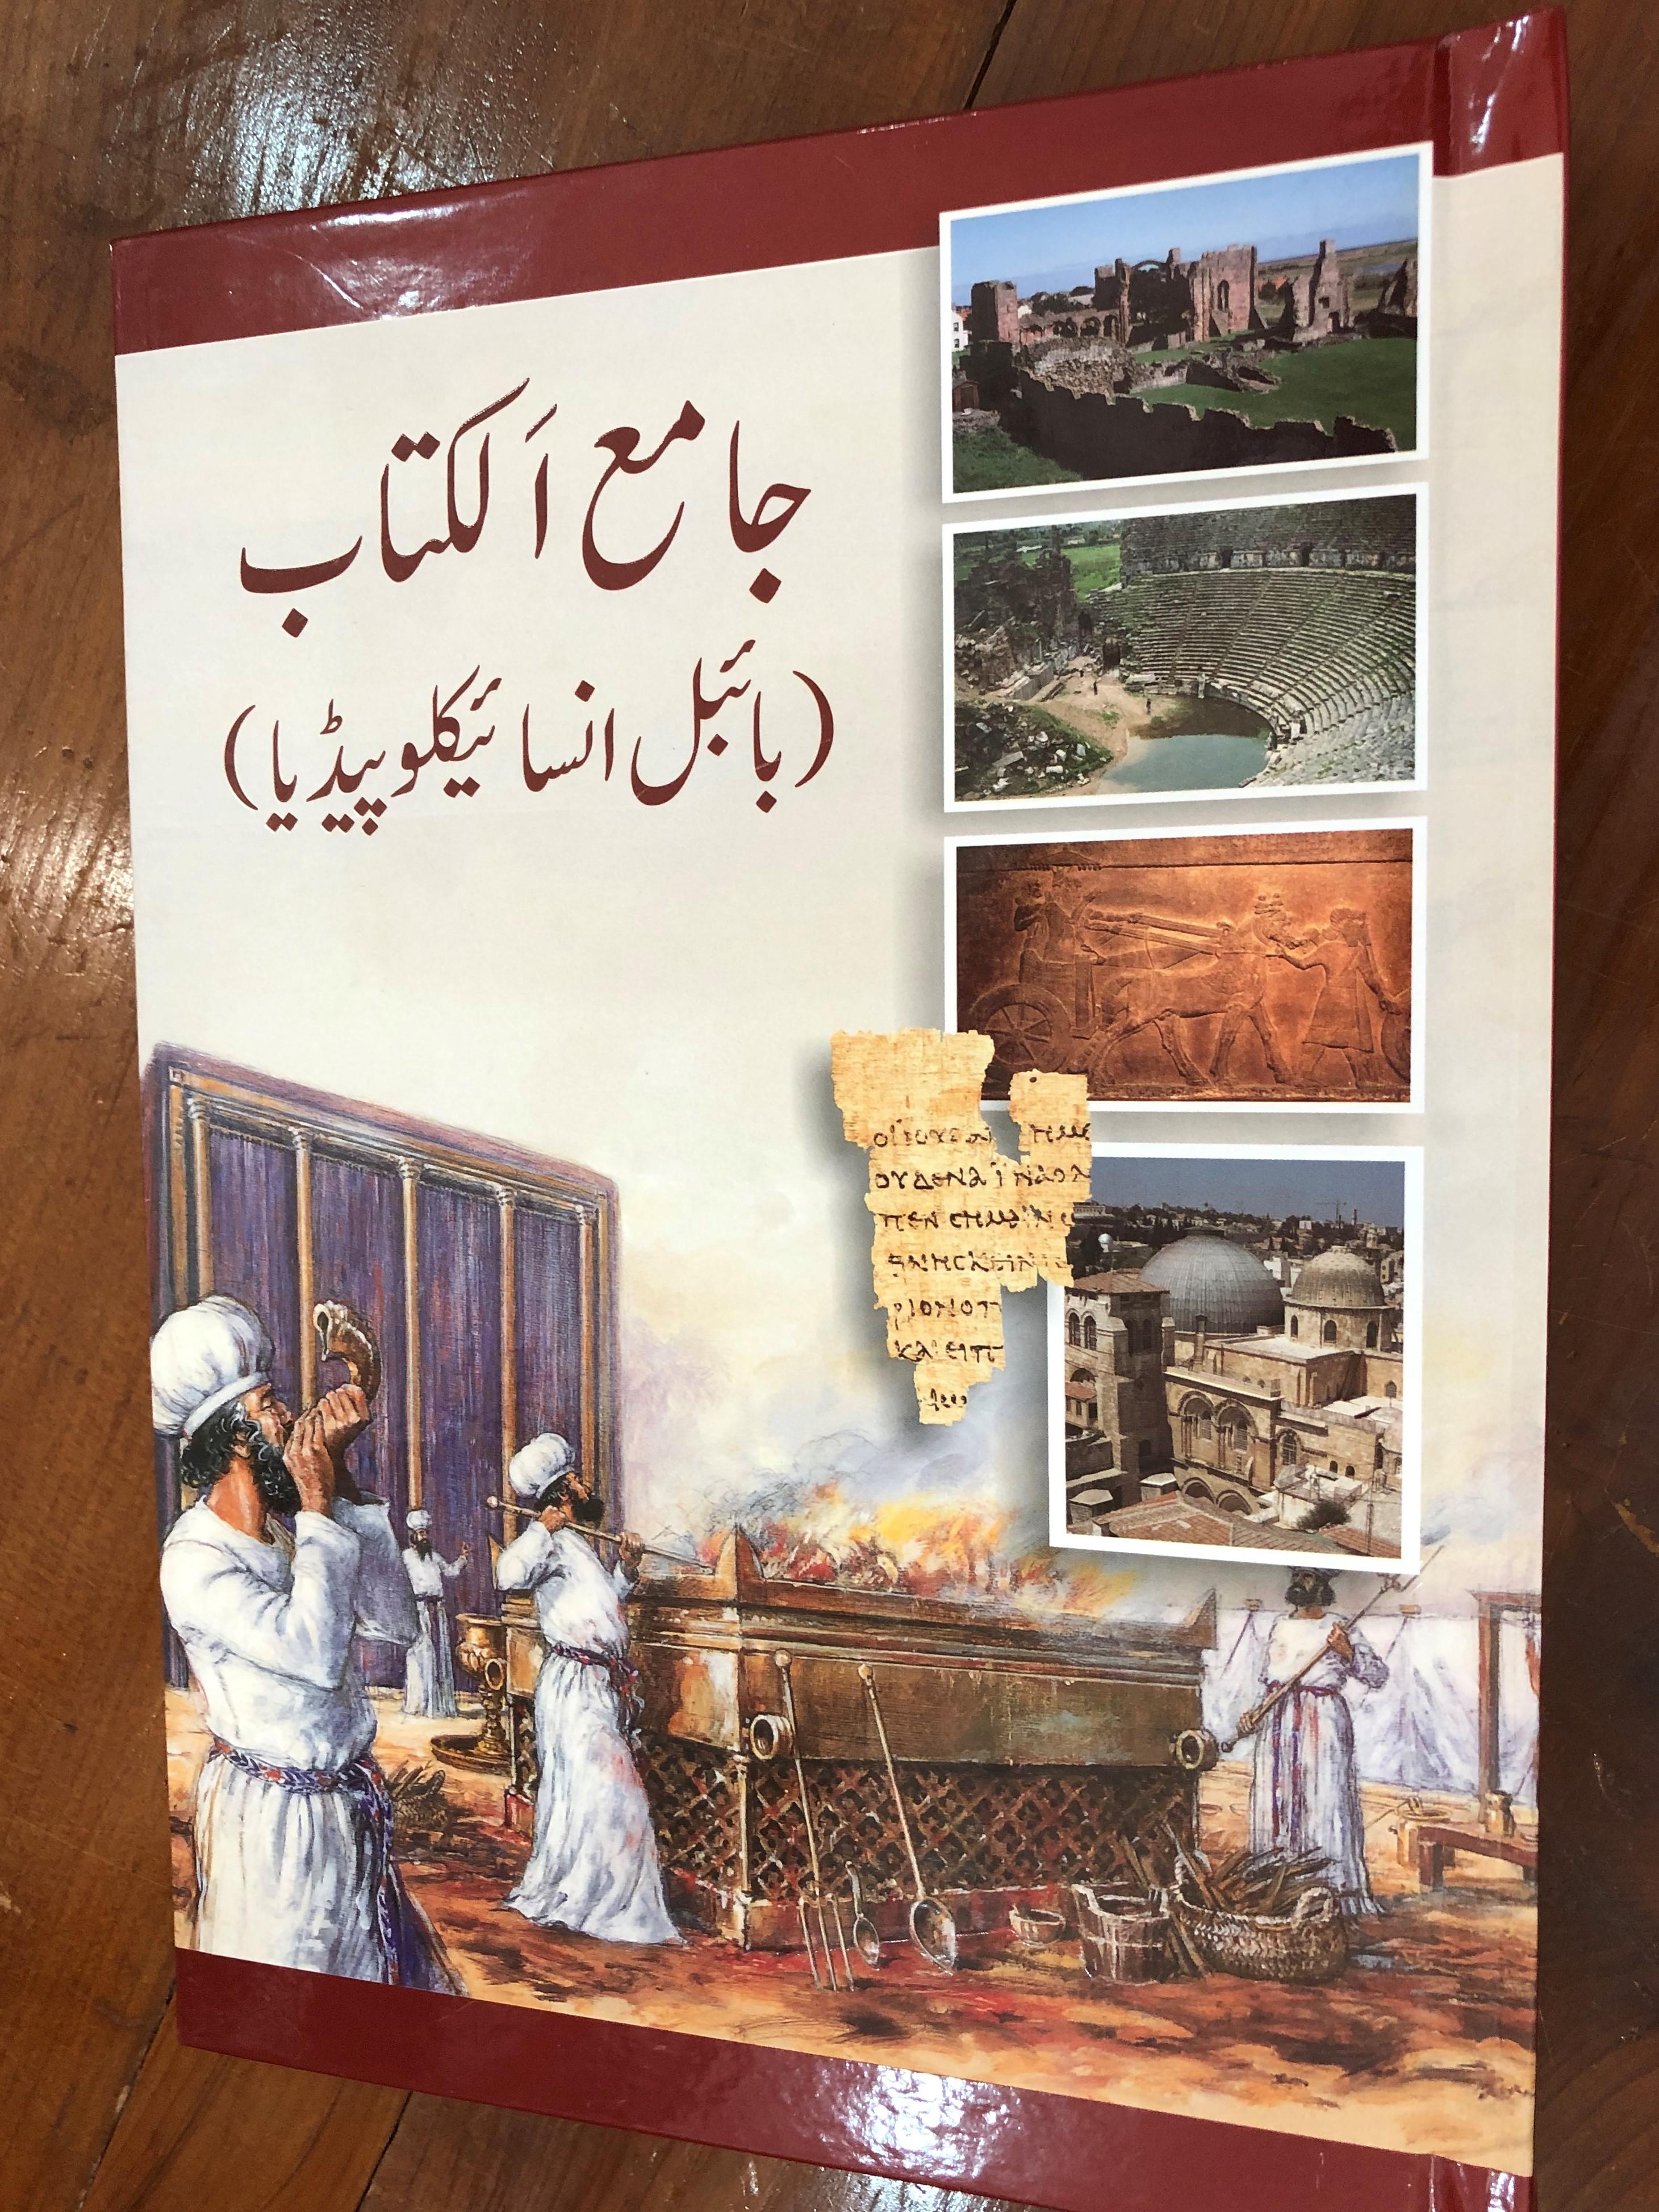 the-bible-encyclopedia-in-urdu-language-translated-from-12-english-titles-pakistan-bible-society-2018-hardcover-1-.jpg